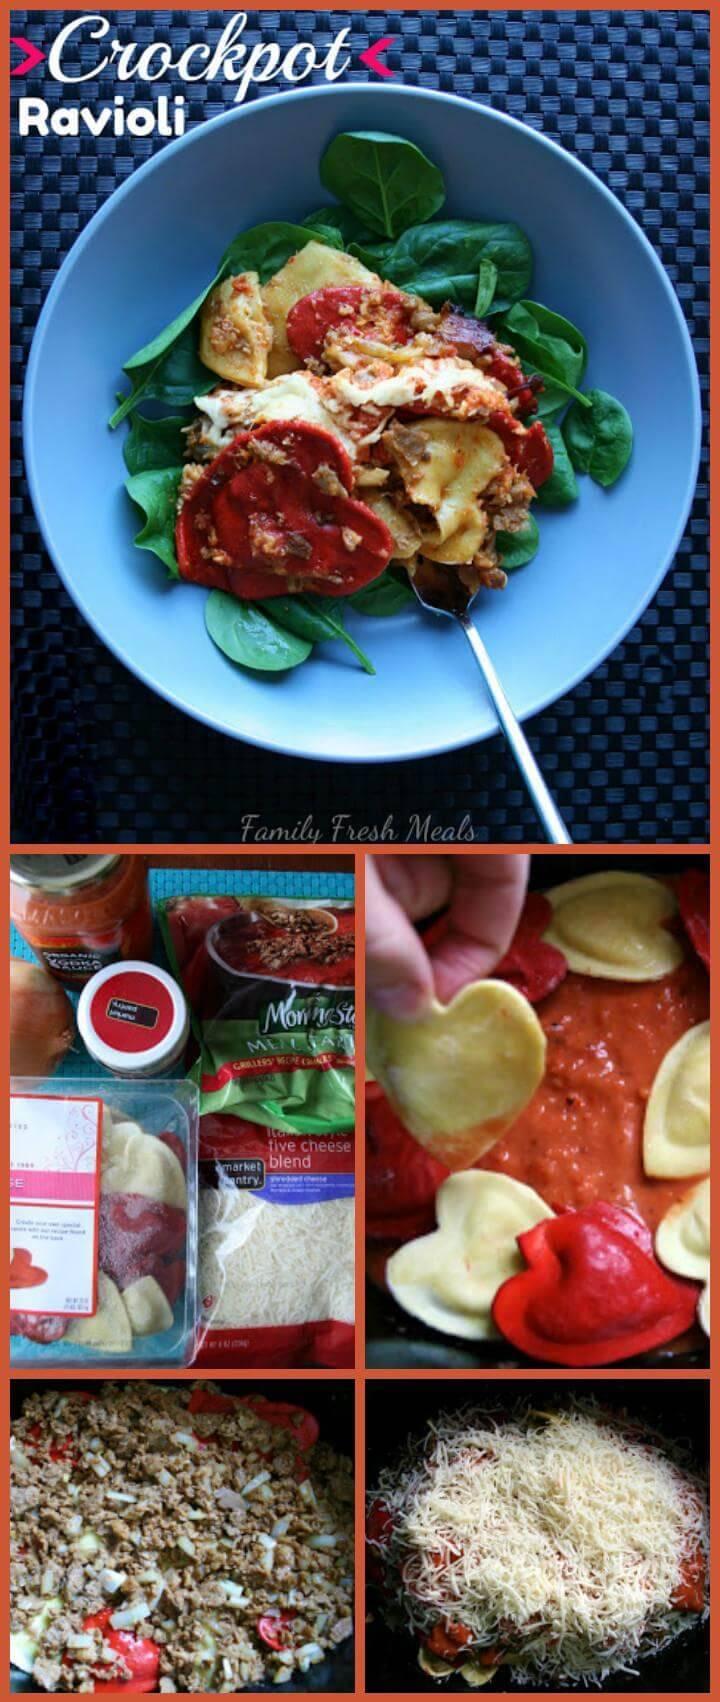 yummy crockpot ravioli recipe